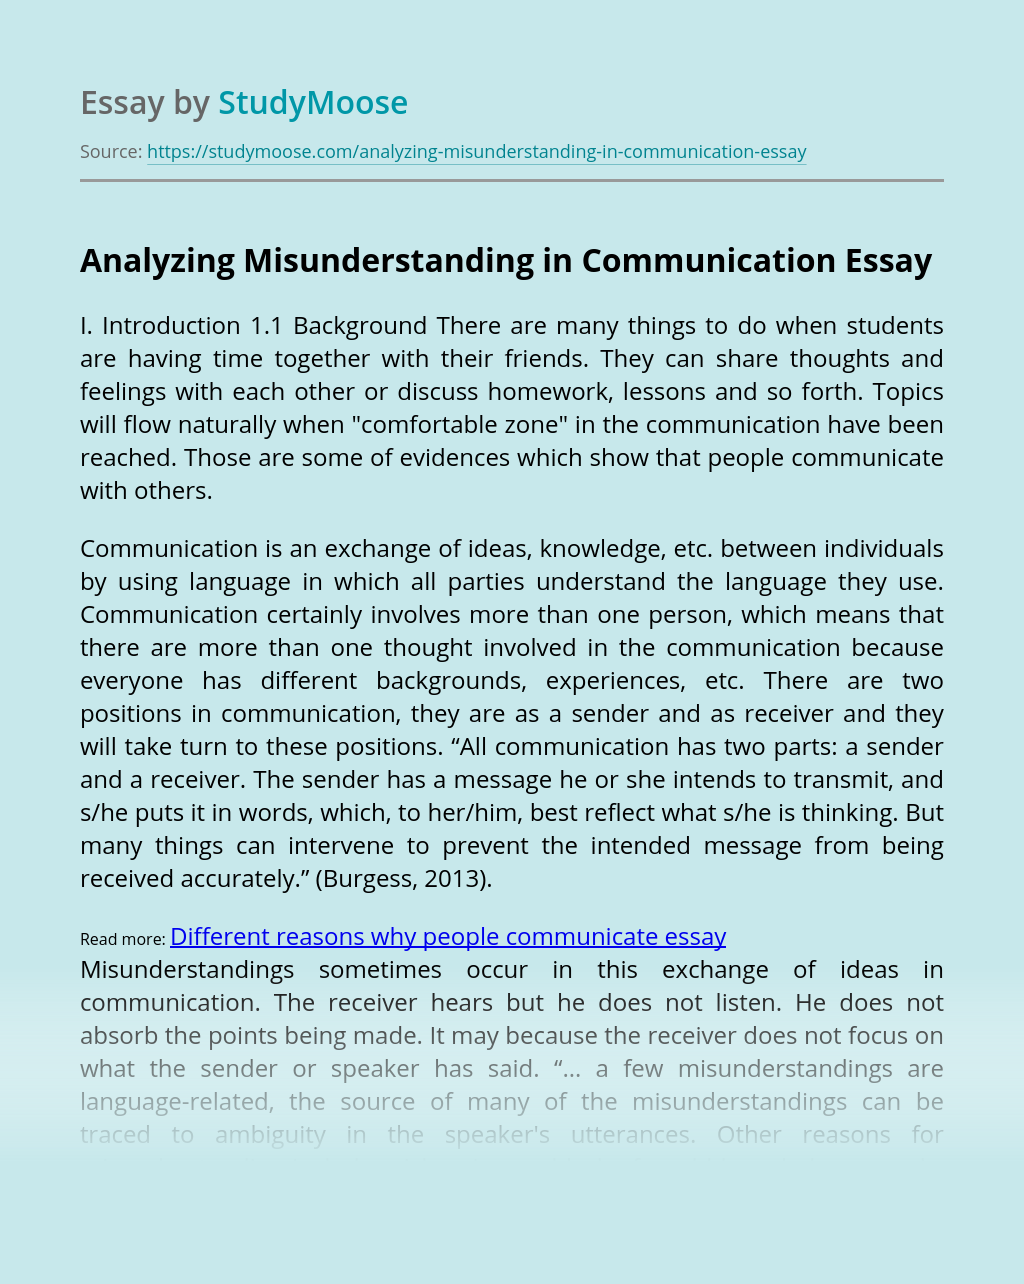 Analyzing Misunderstanding in Communication